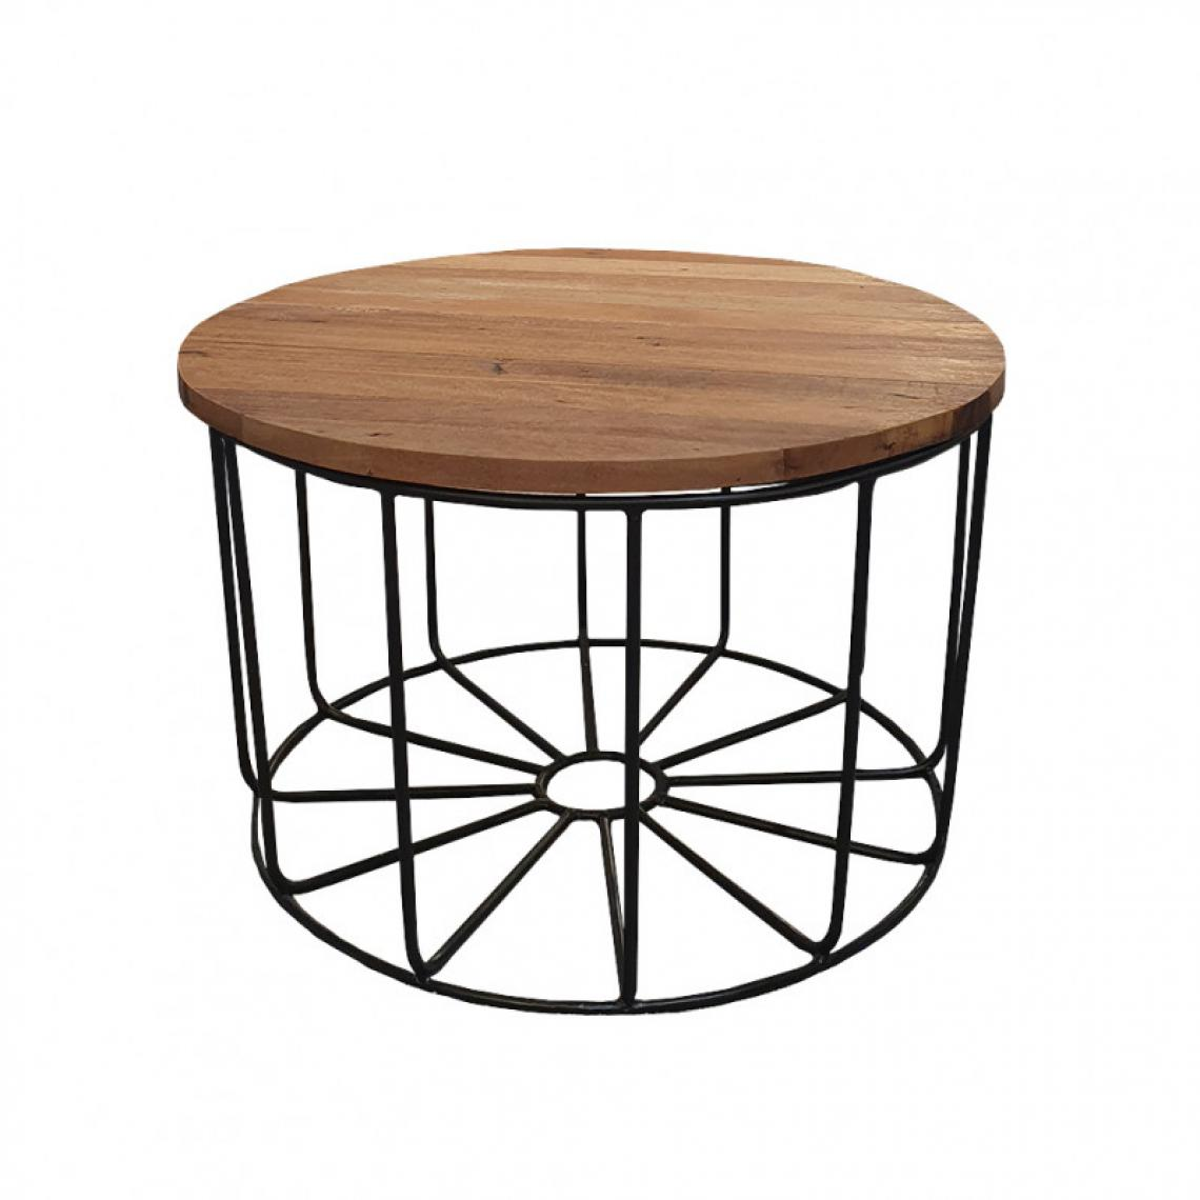 Meubletmoi Table basse ronde en métal et plateau amovible en teck D.65 cm - TEKO